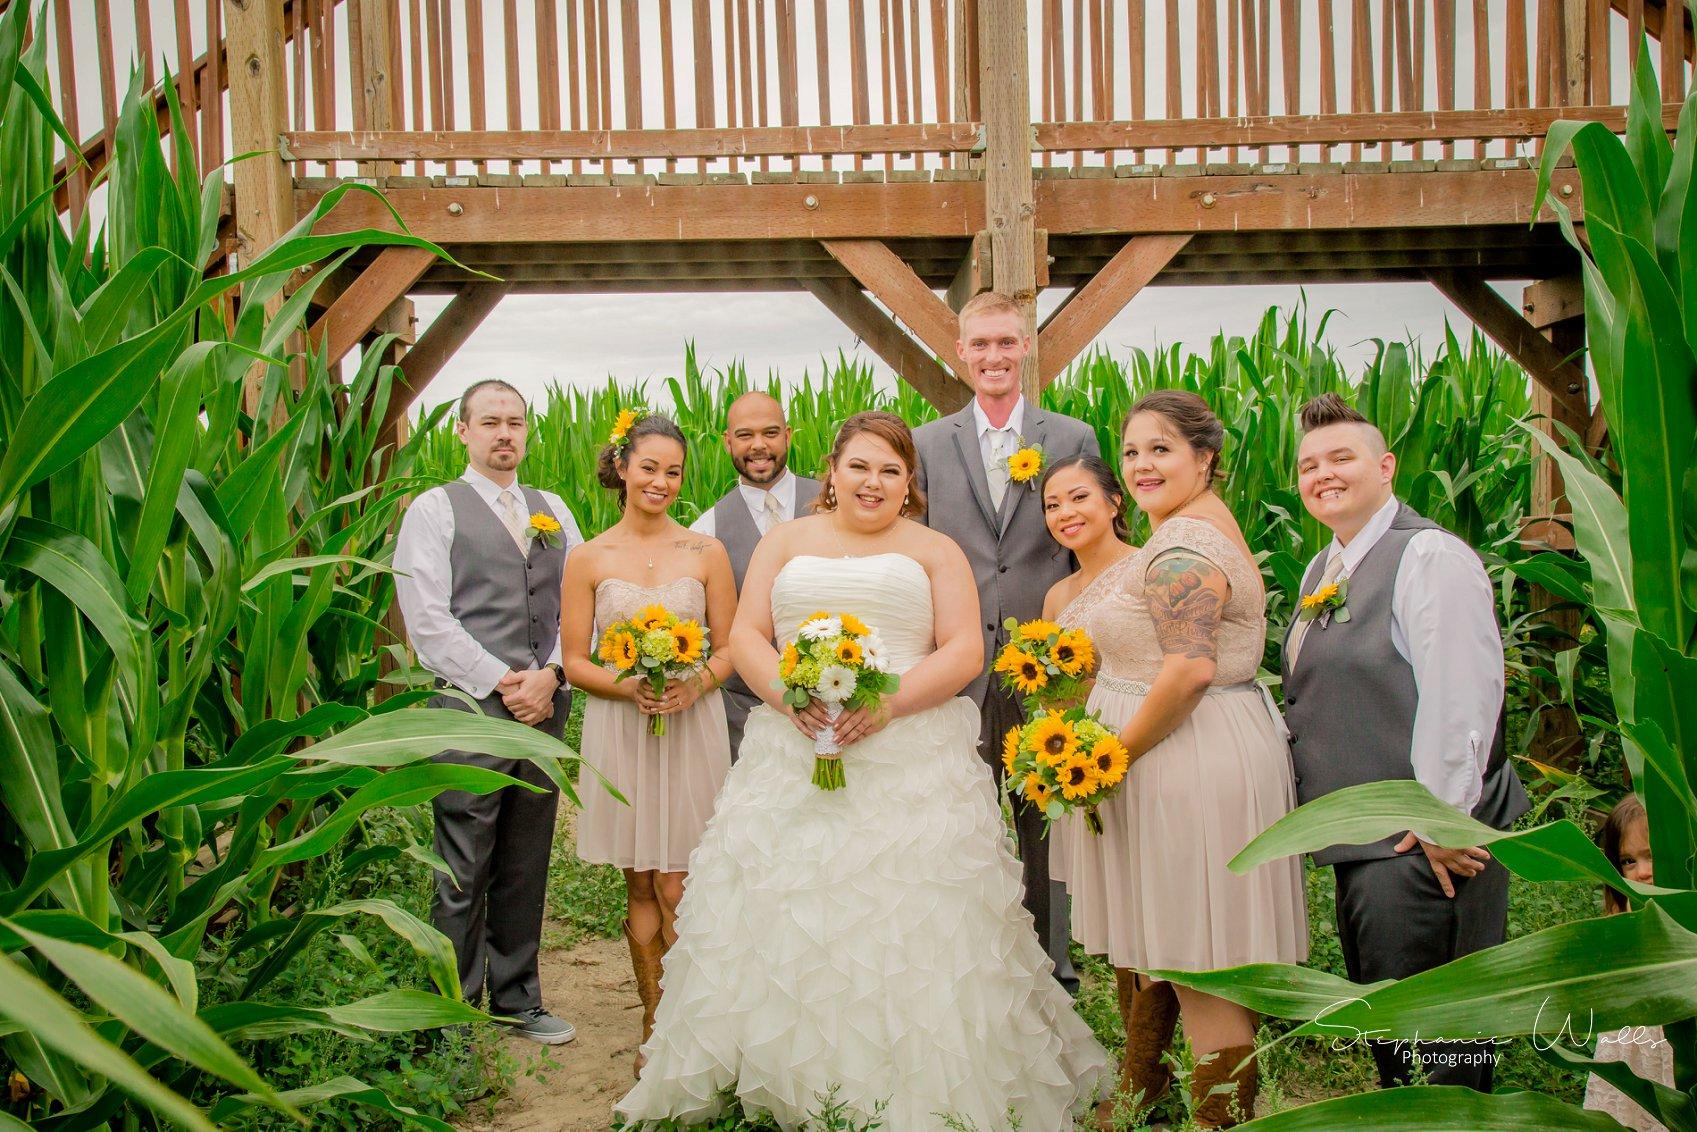 Kimble Wedding 026 1 Marlena & Allans | Snohomish Red Barn Events (Stocker Farms) | Snohomish, Wa Wedding Photographer